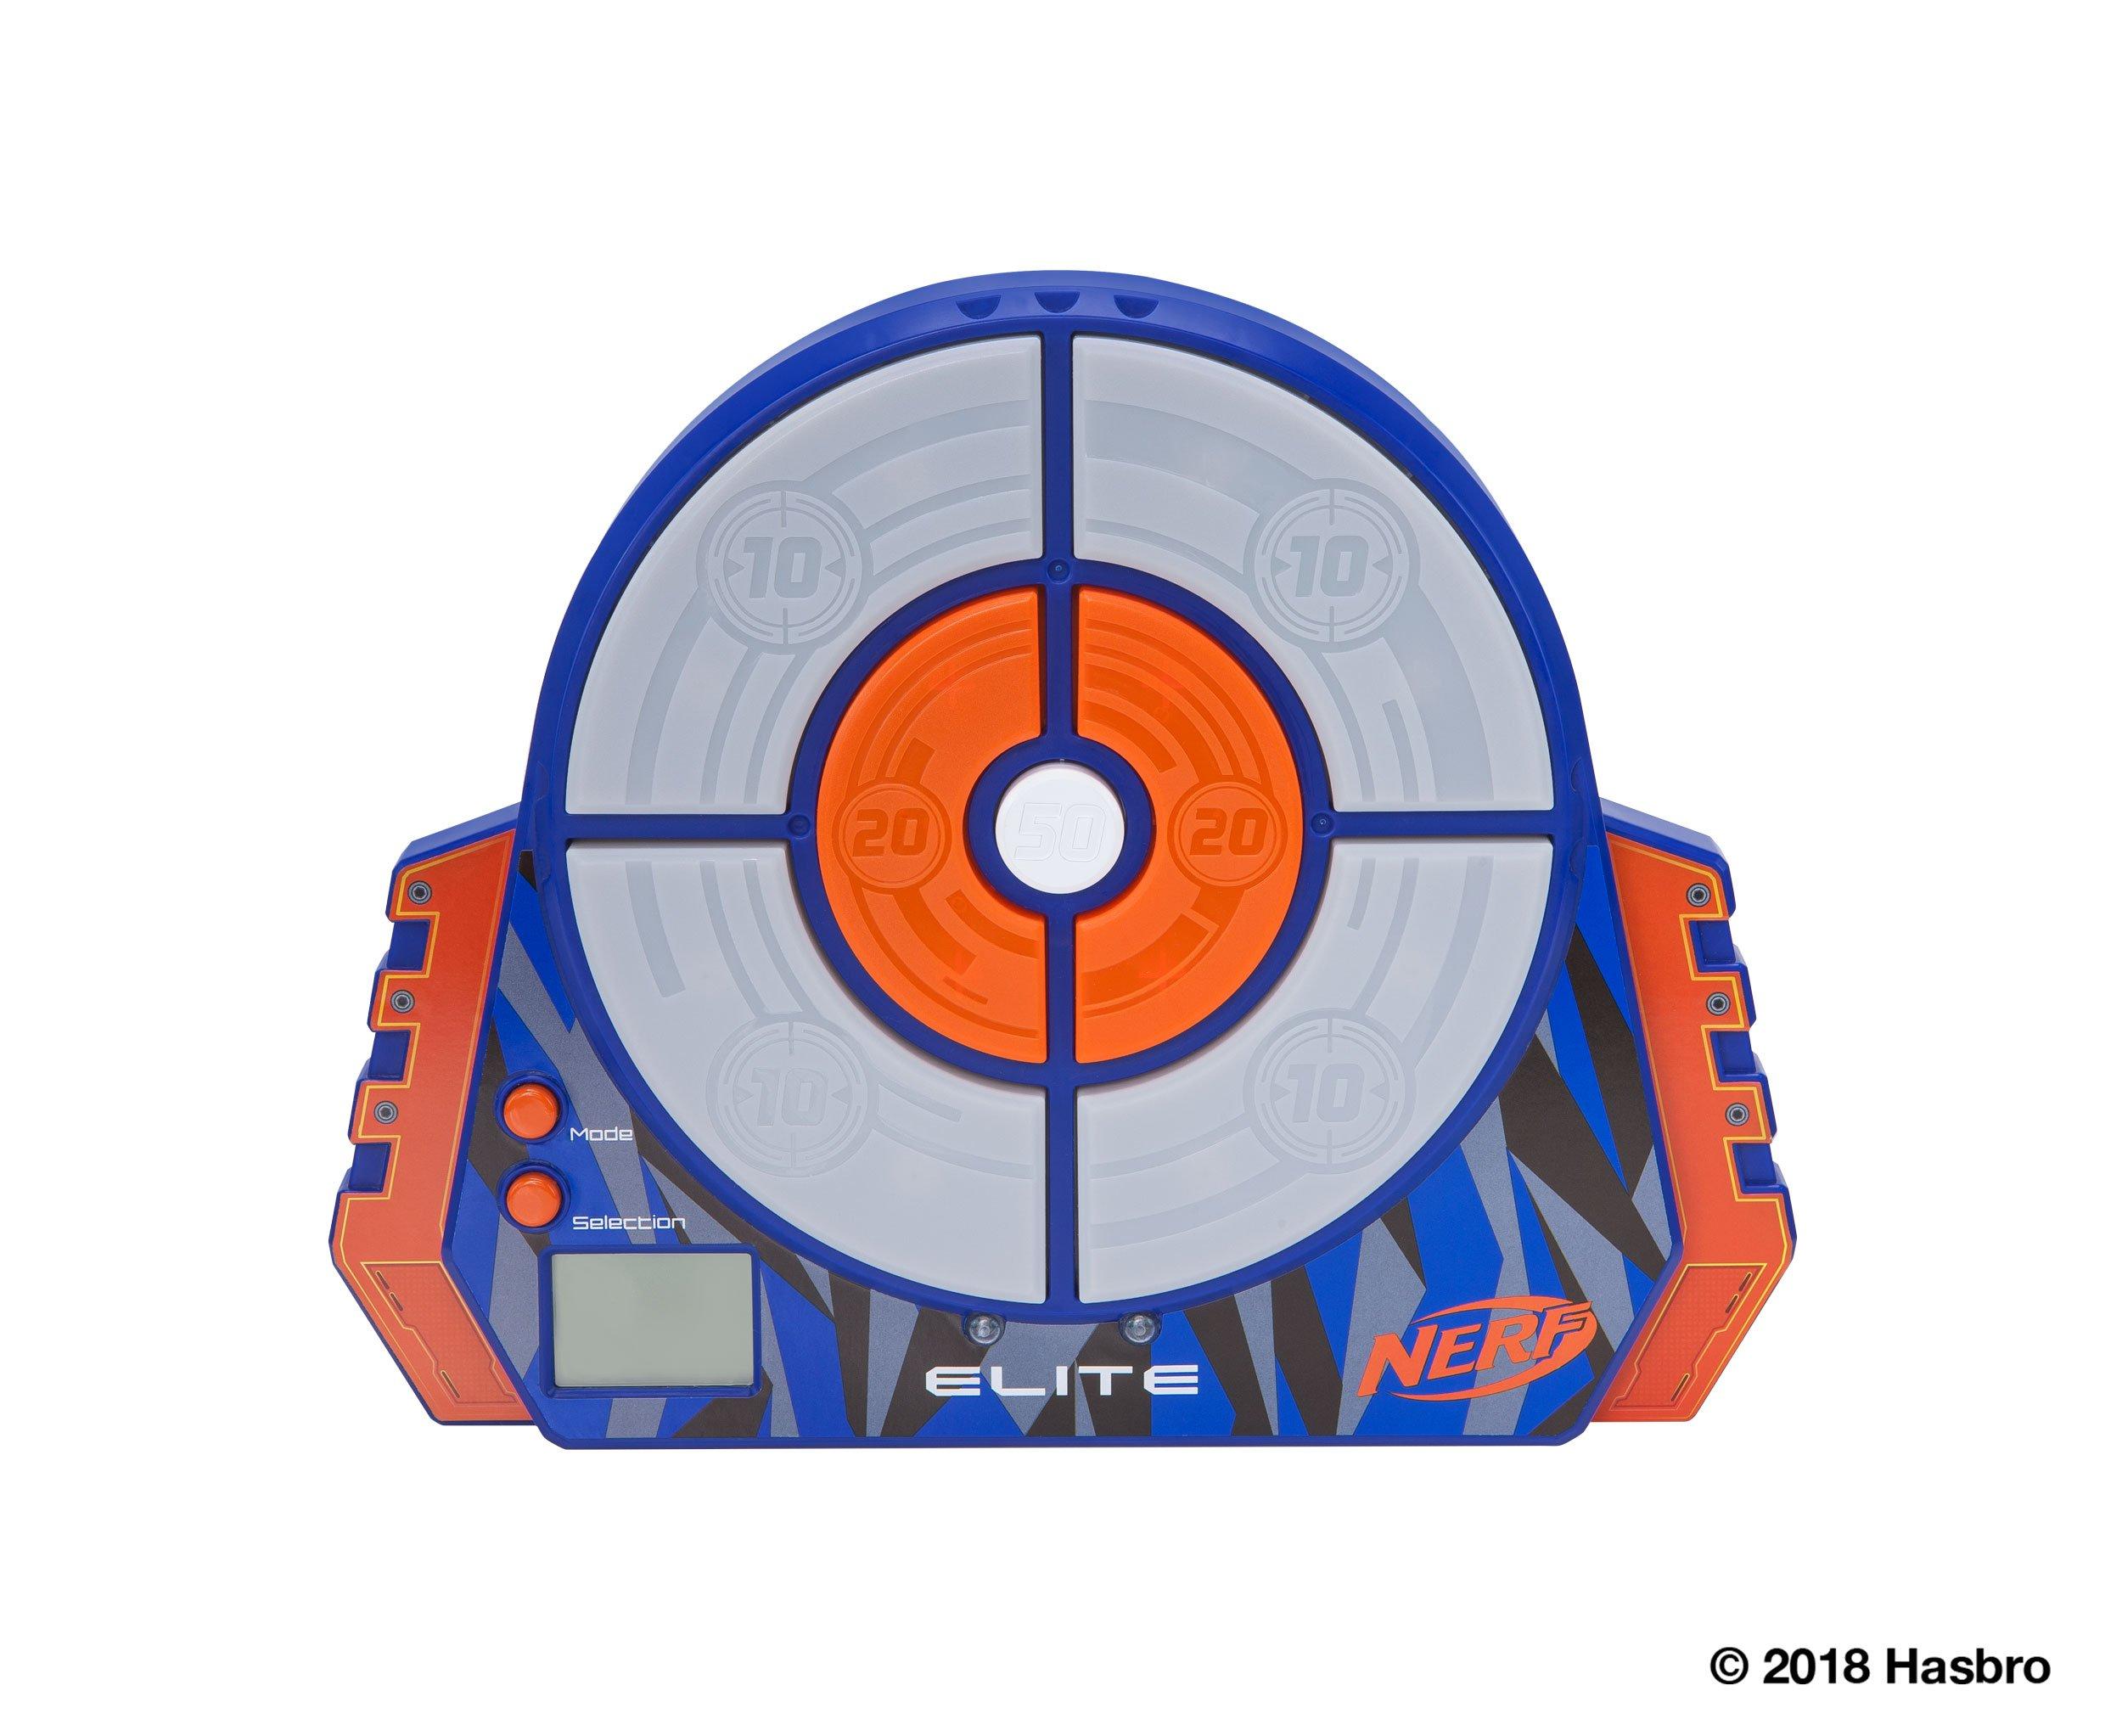 NERF Elite Digital Target Toy, Standard by NERF